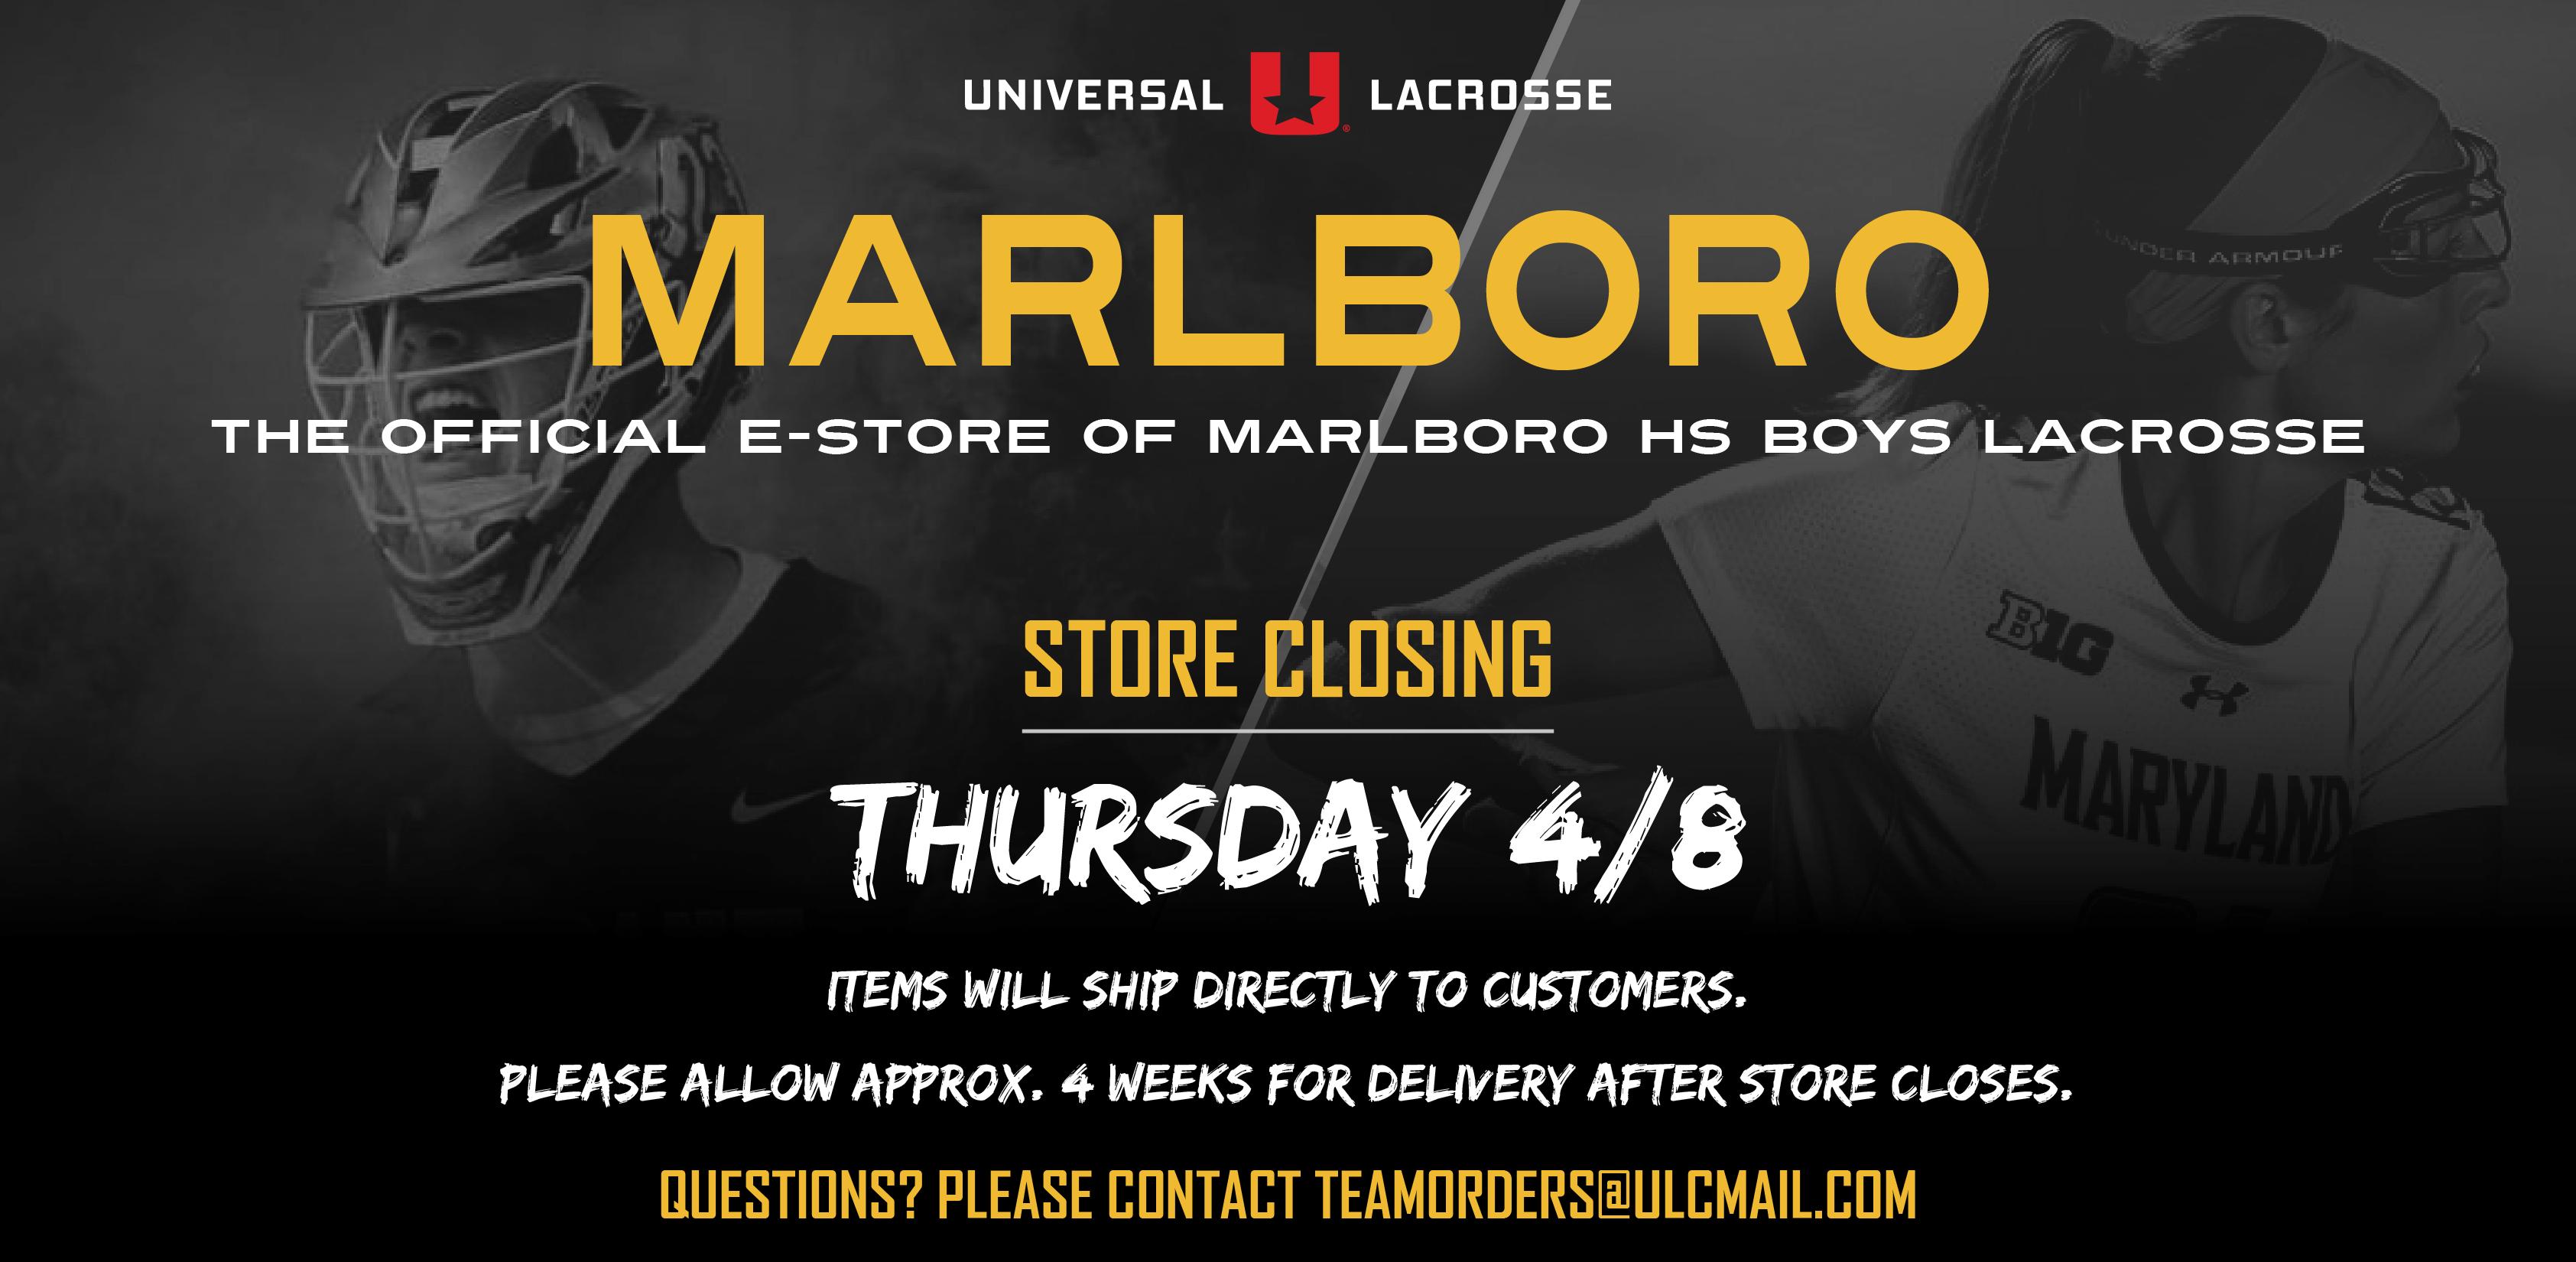 Marlboro HS Lacrosse